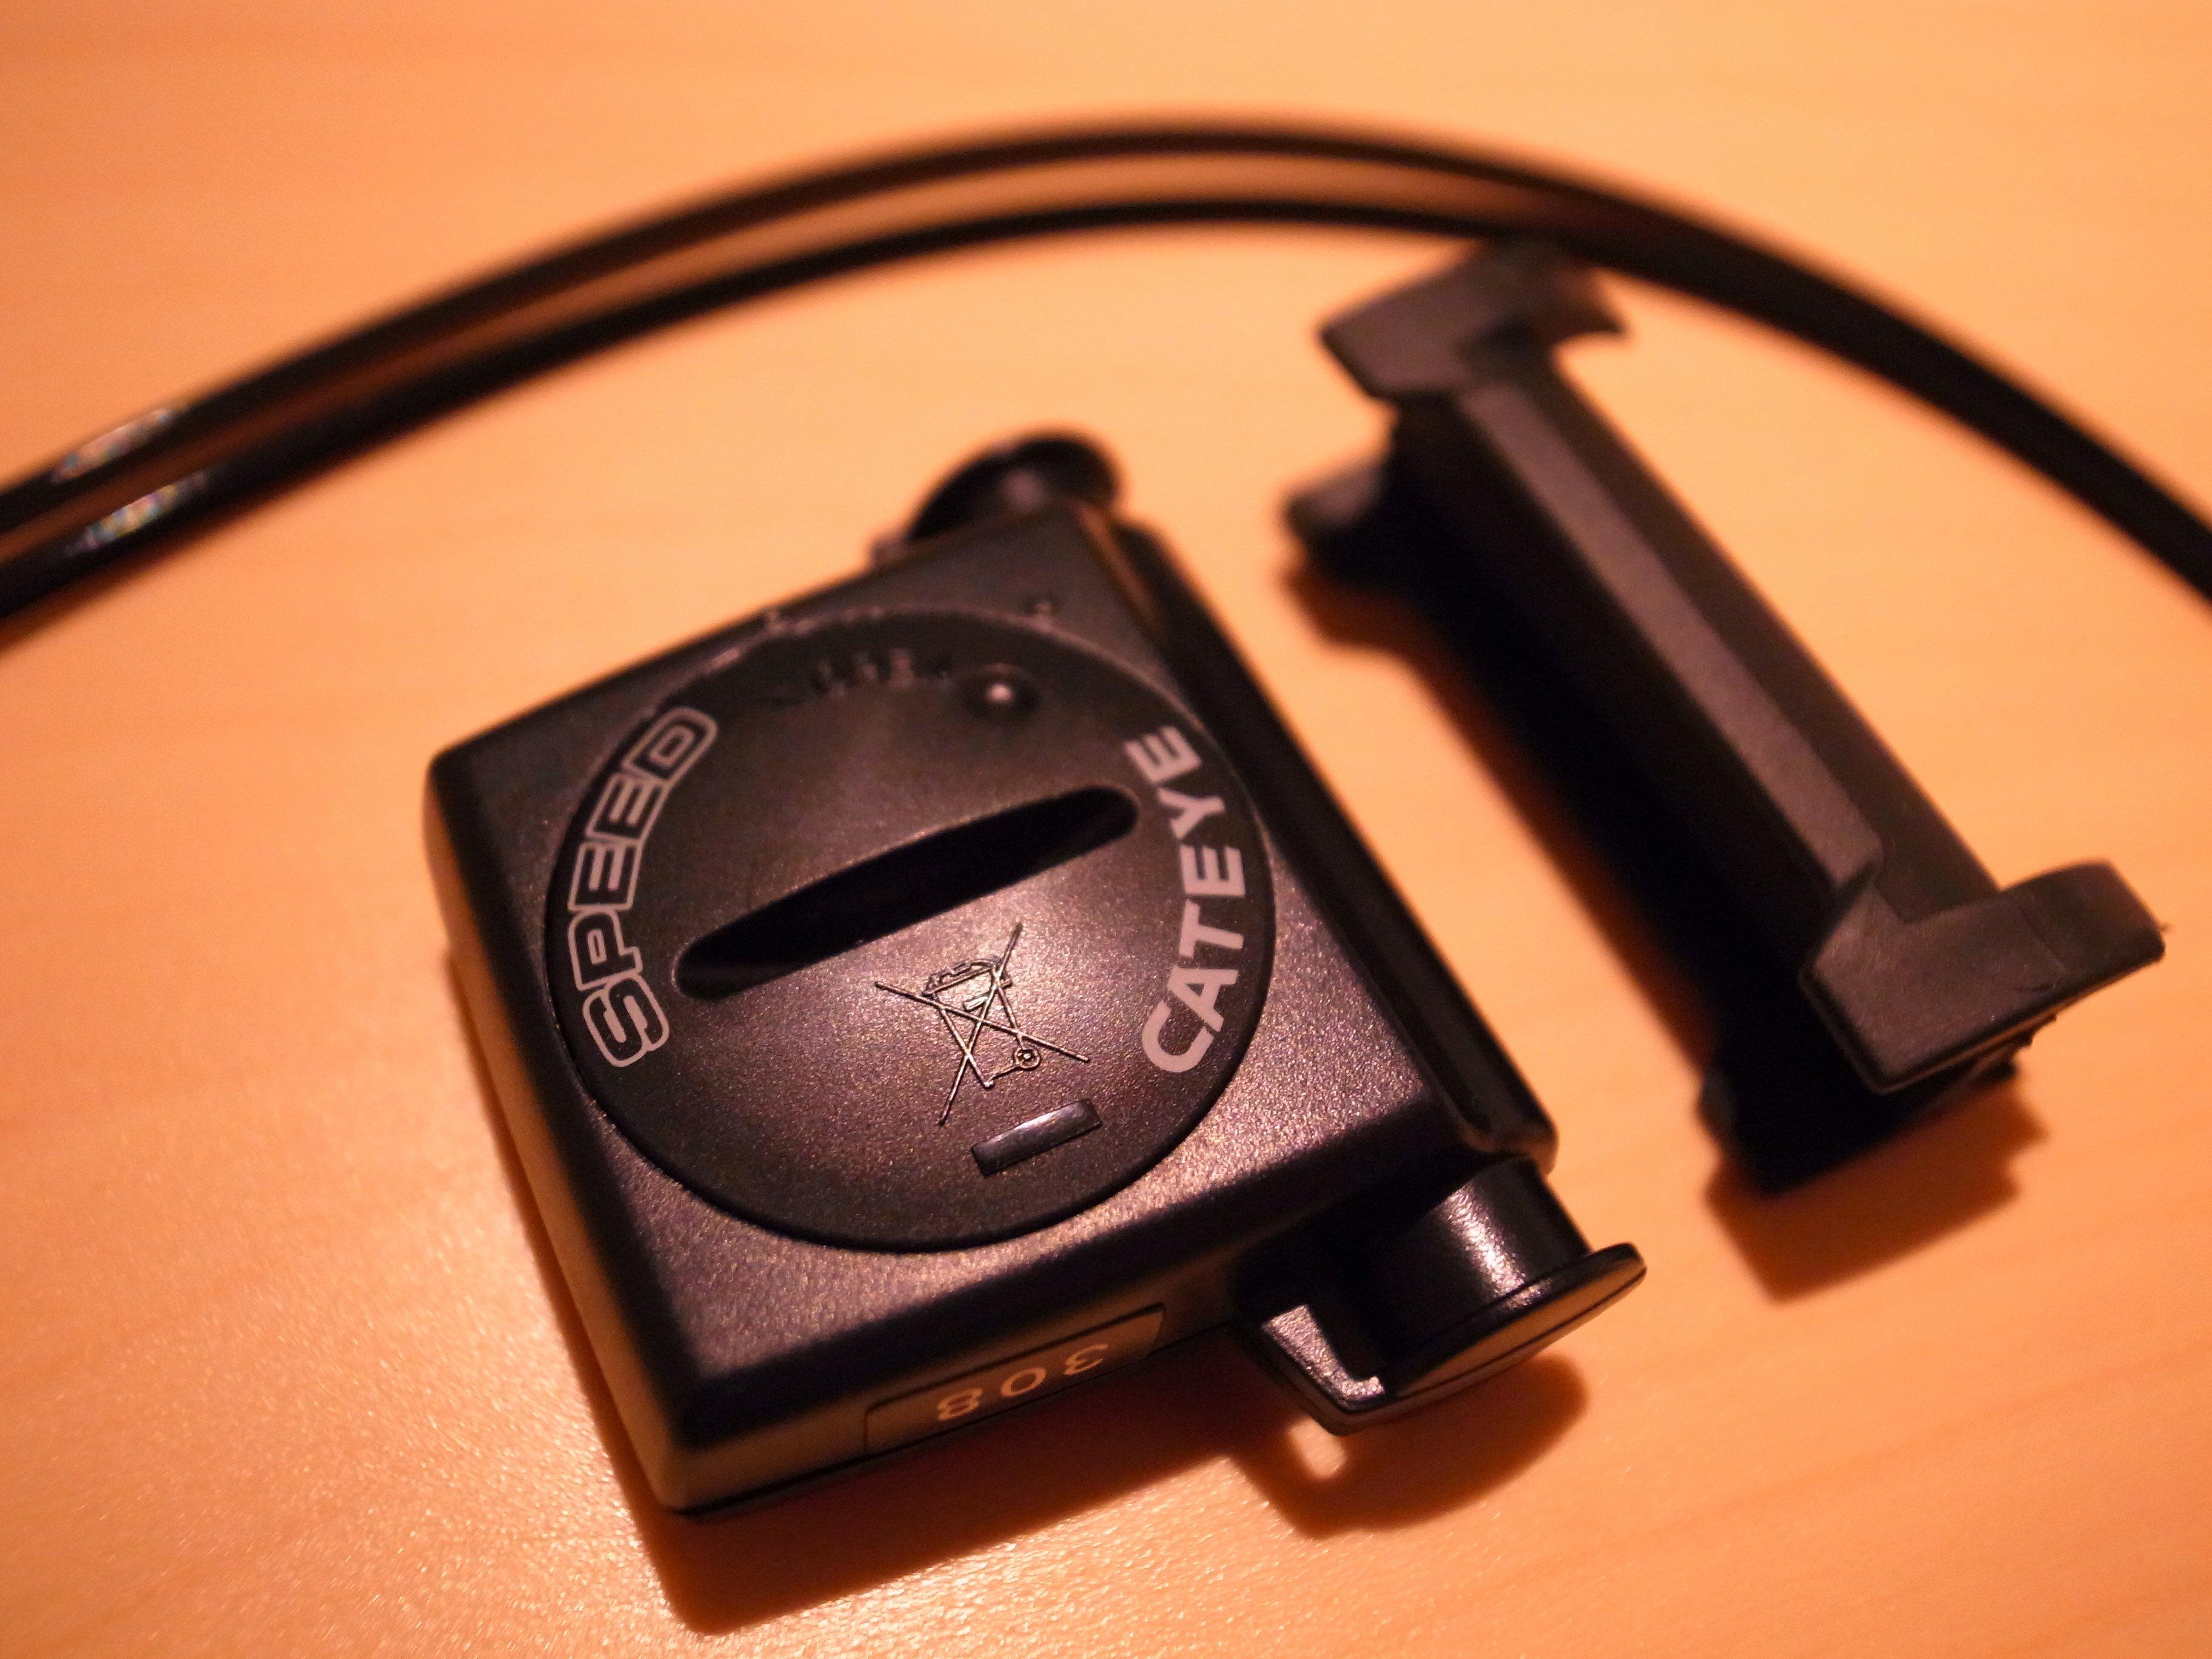 BD-1にスピードセンサー(ベロワイヤレス プラス CC-VT210W)取り付け